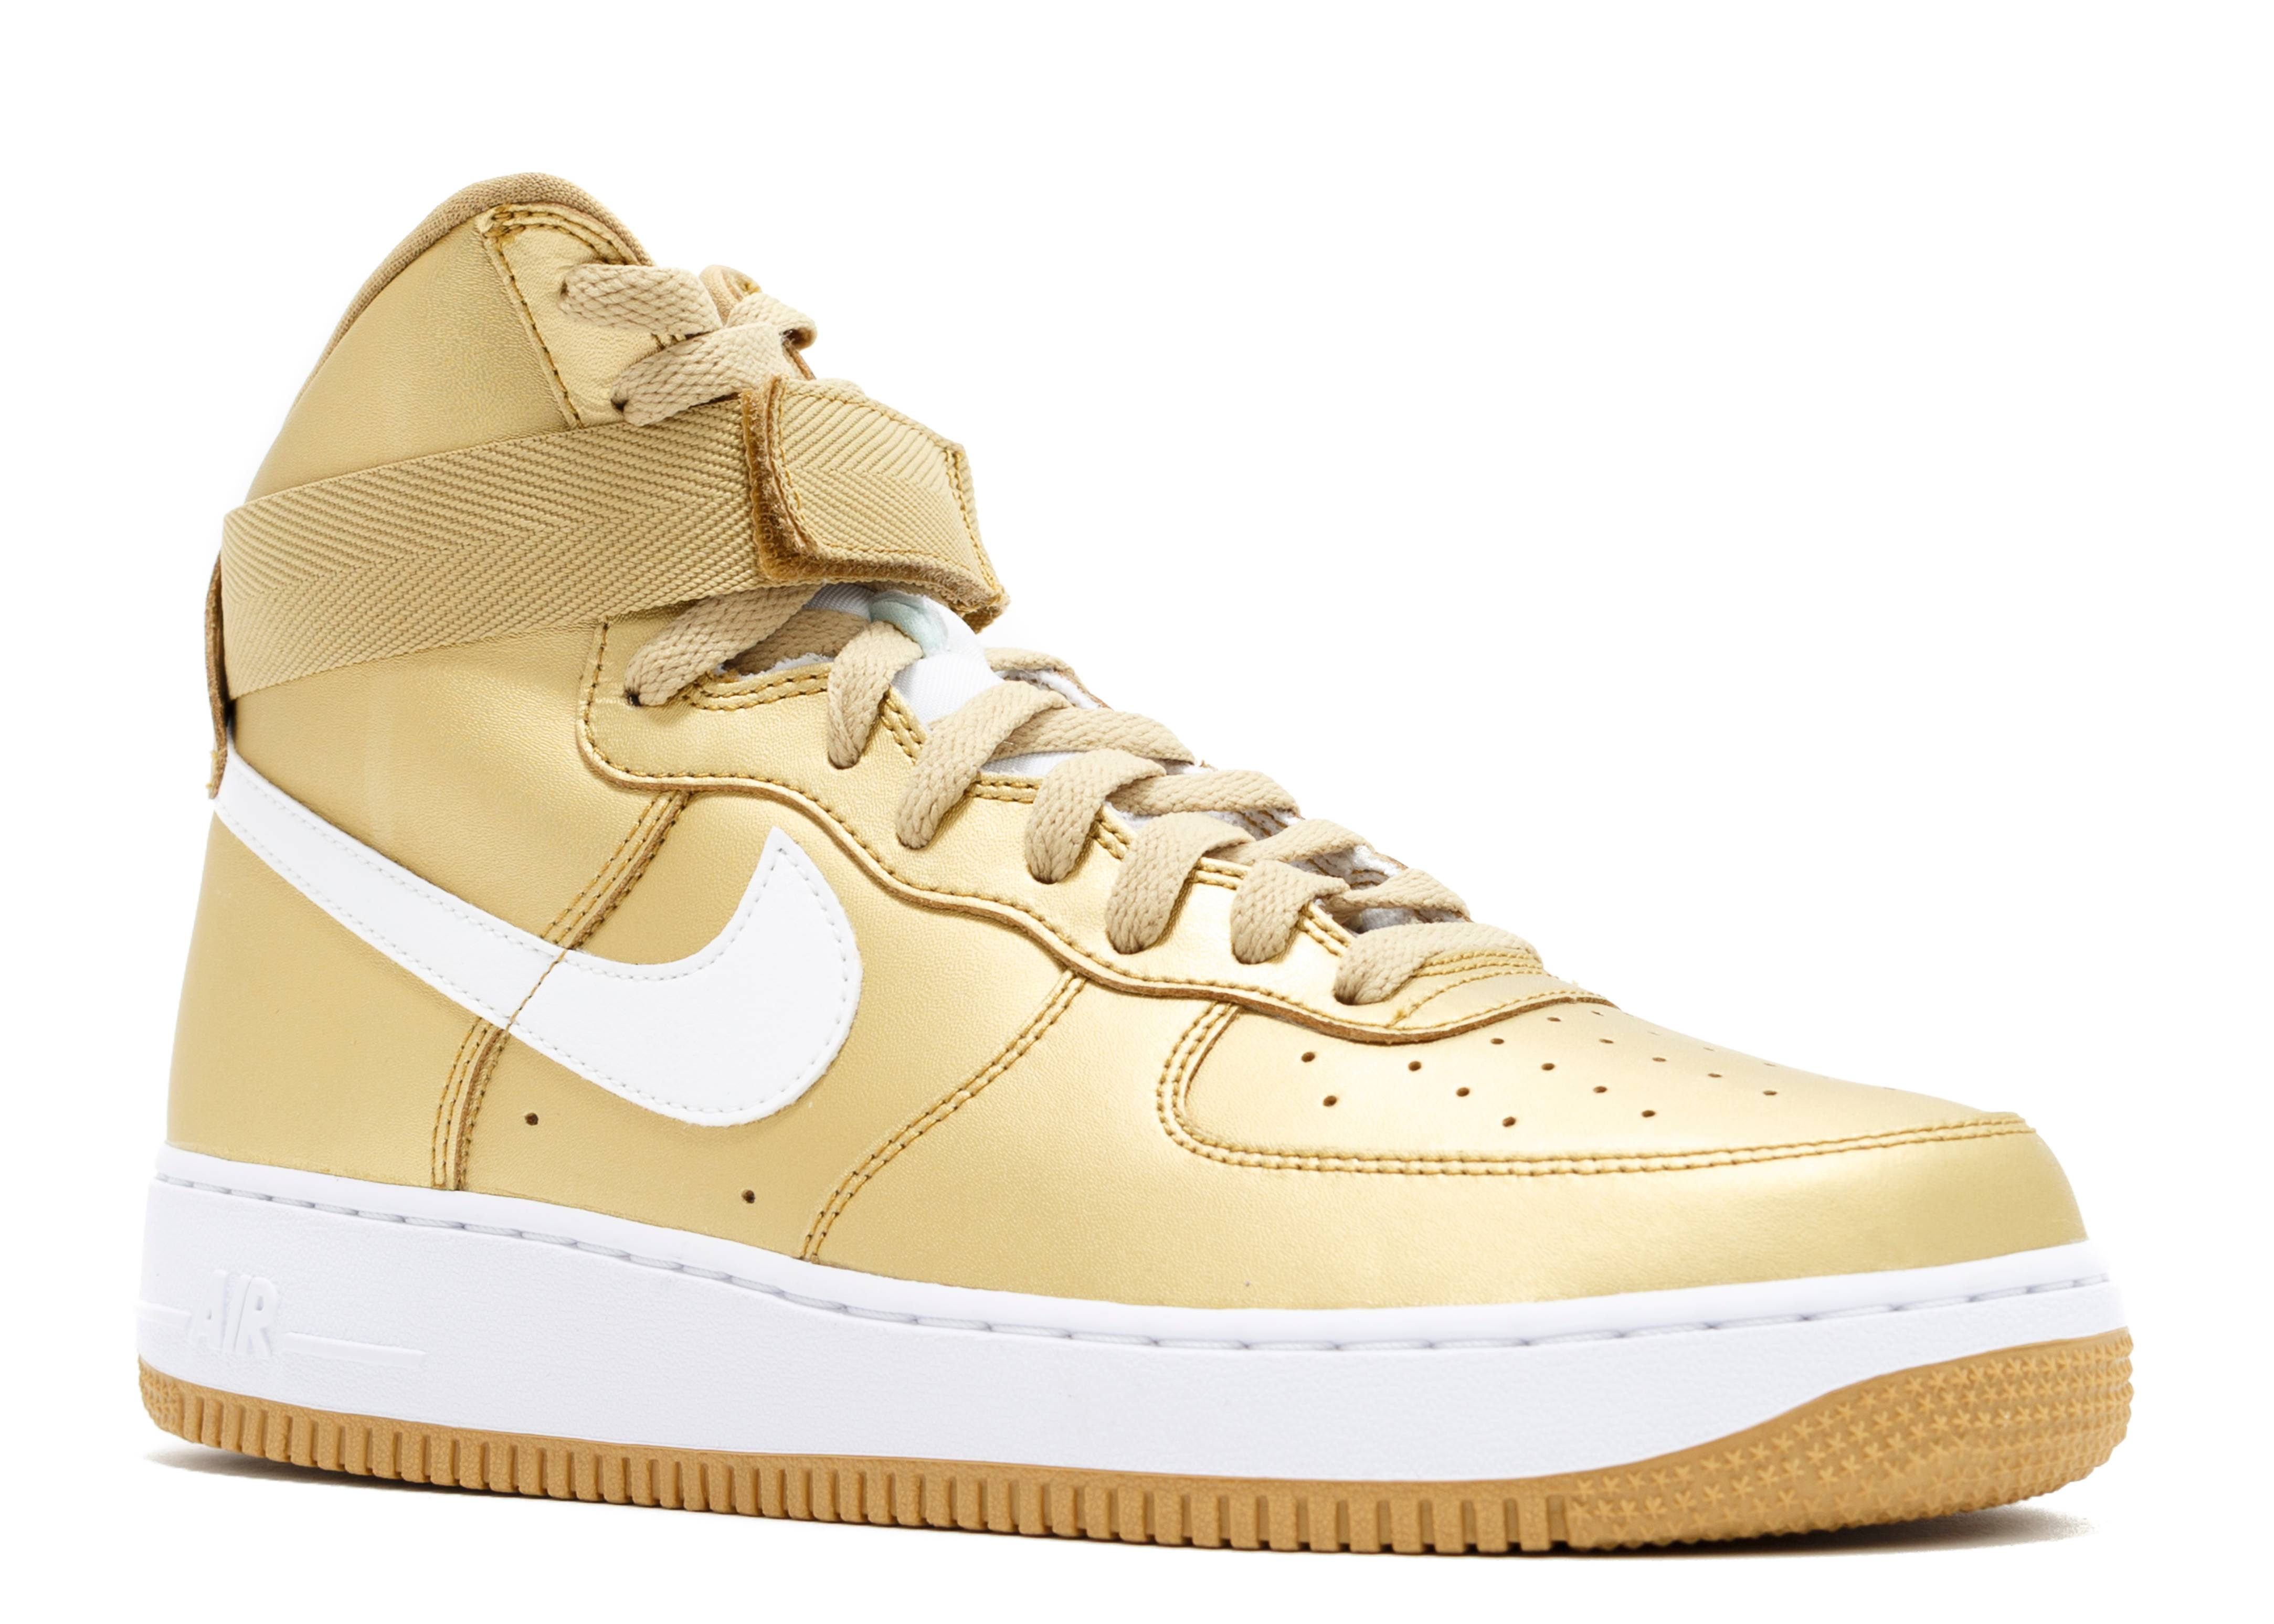 buy popular f97f3 c3375 where can i buy air force 1 high retro qs nike 823297 700 metallic gold  white